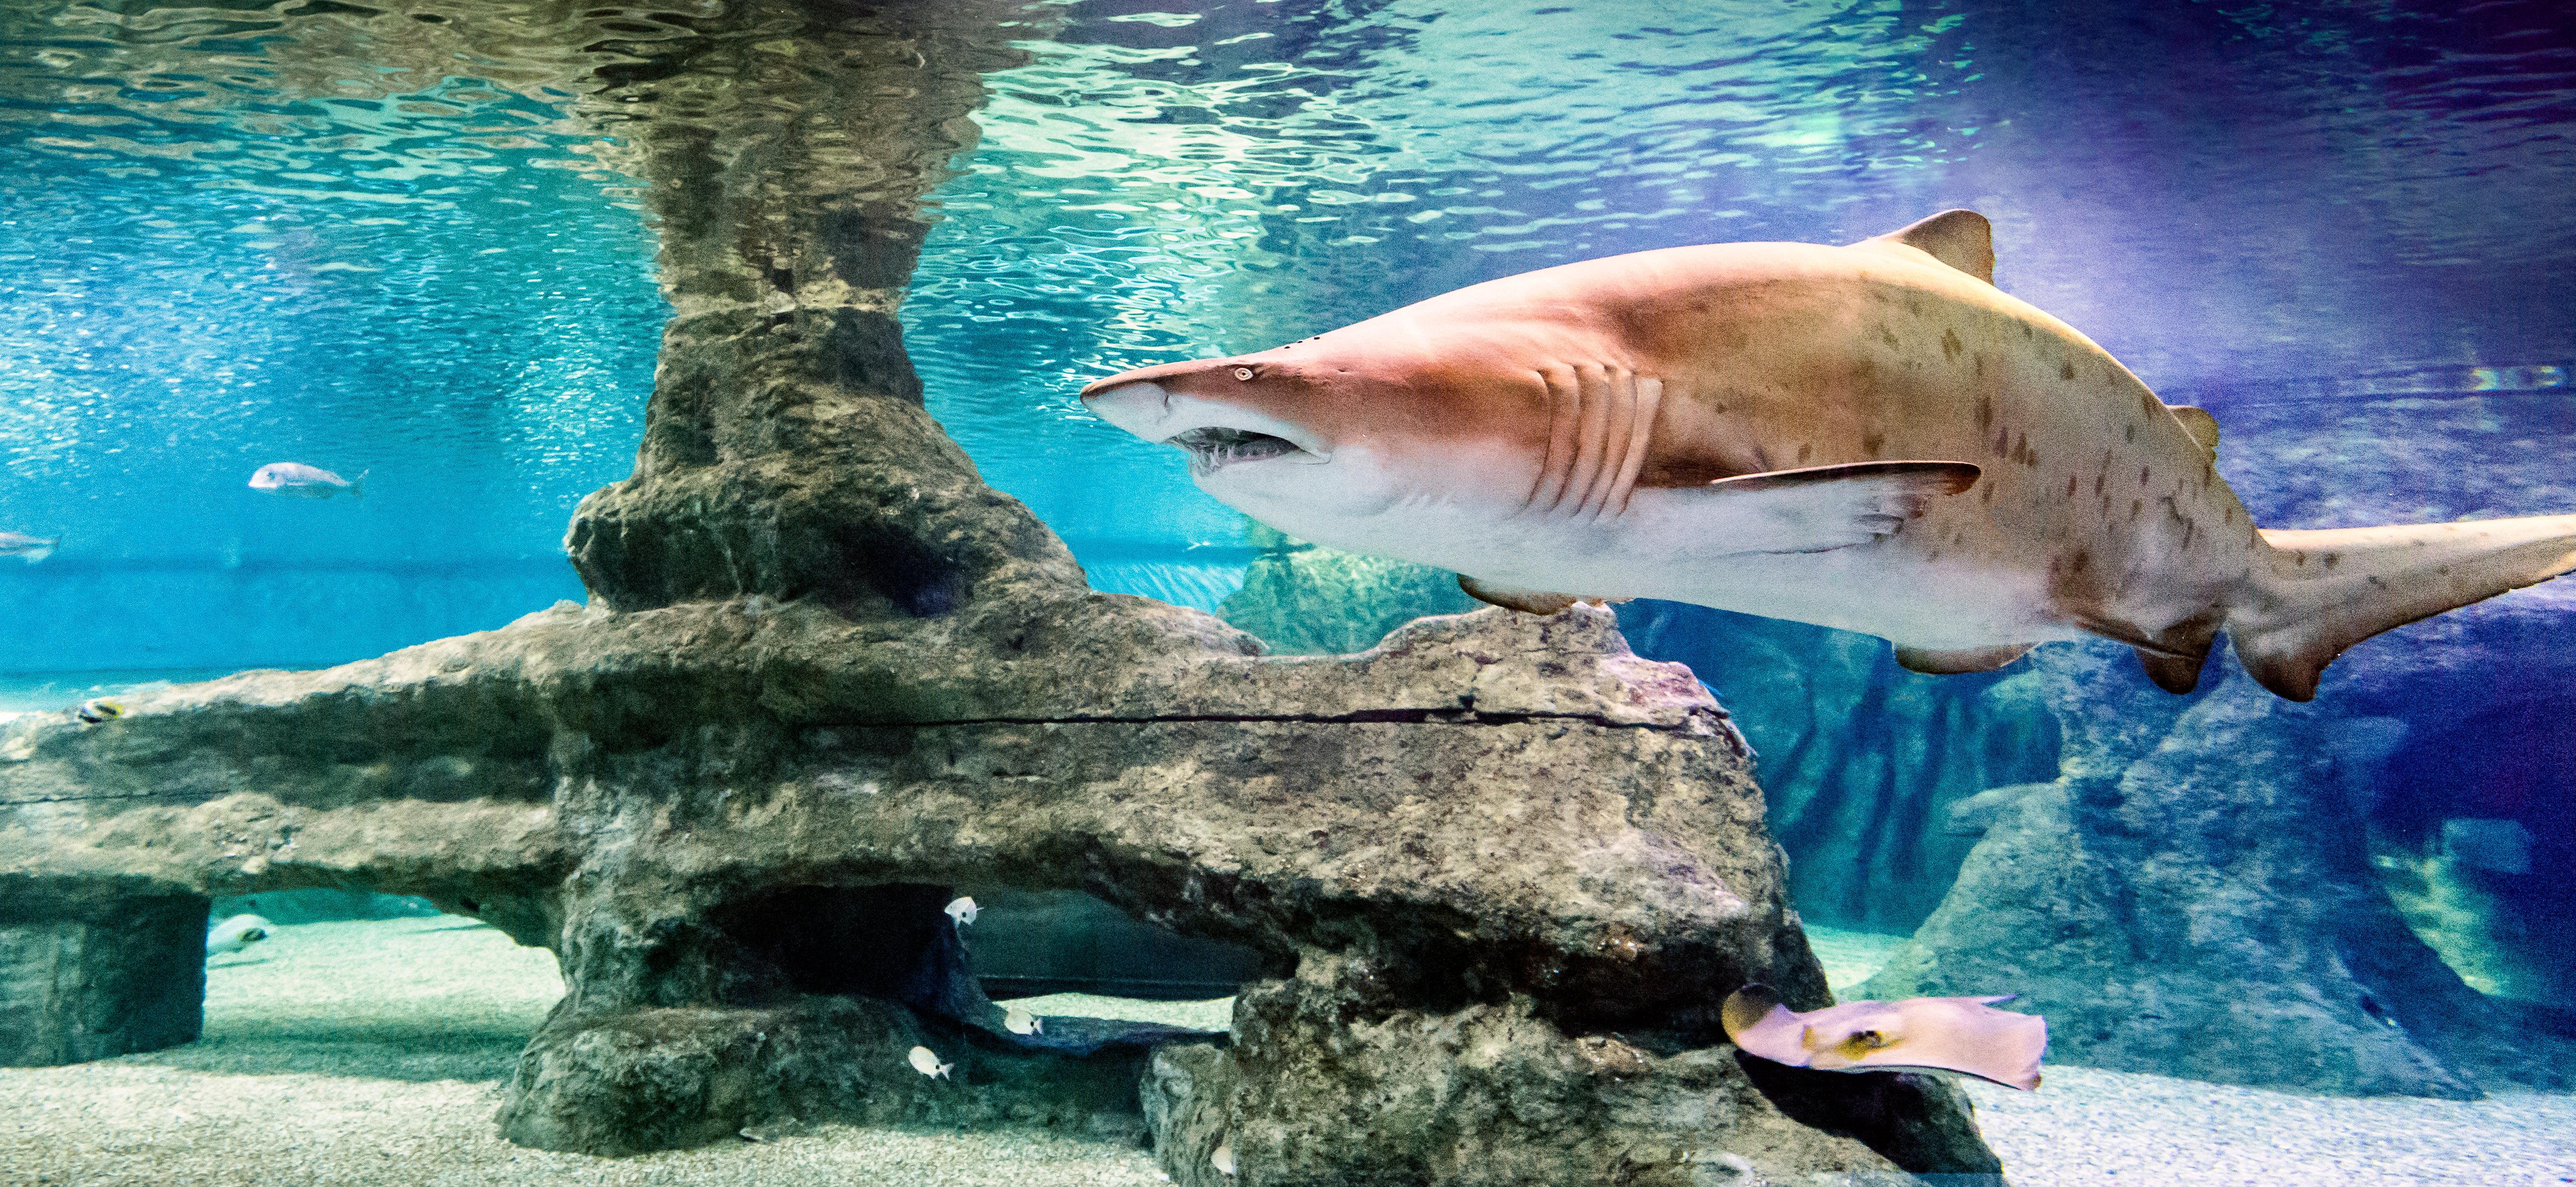 Tickets for the Roquetas de Mar Aquarium